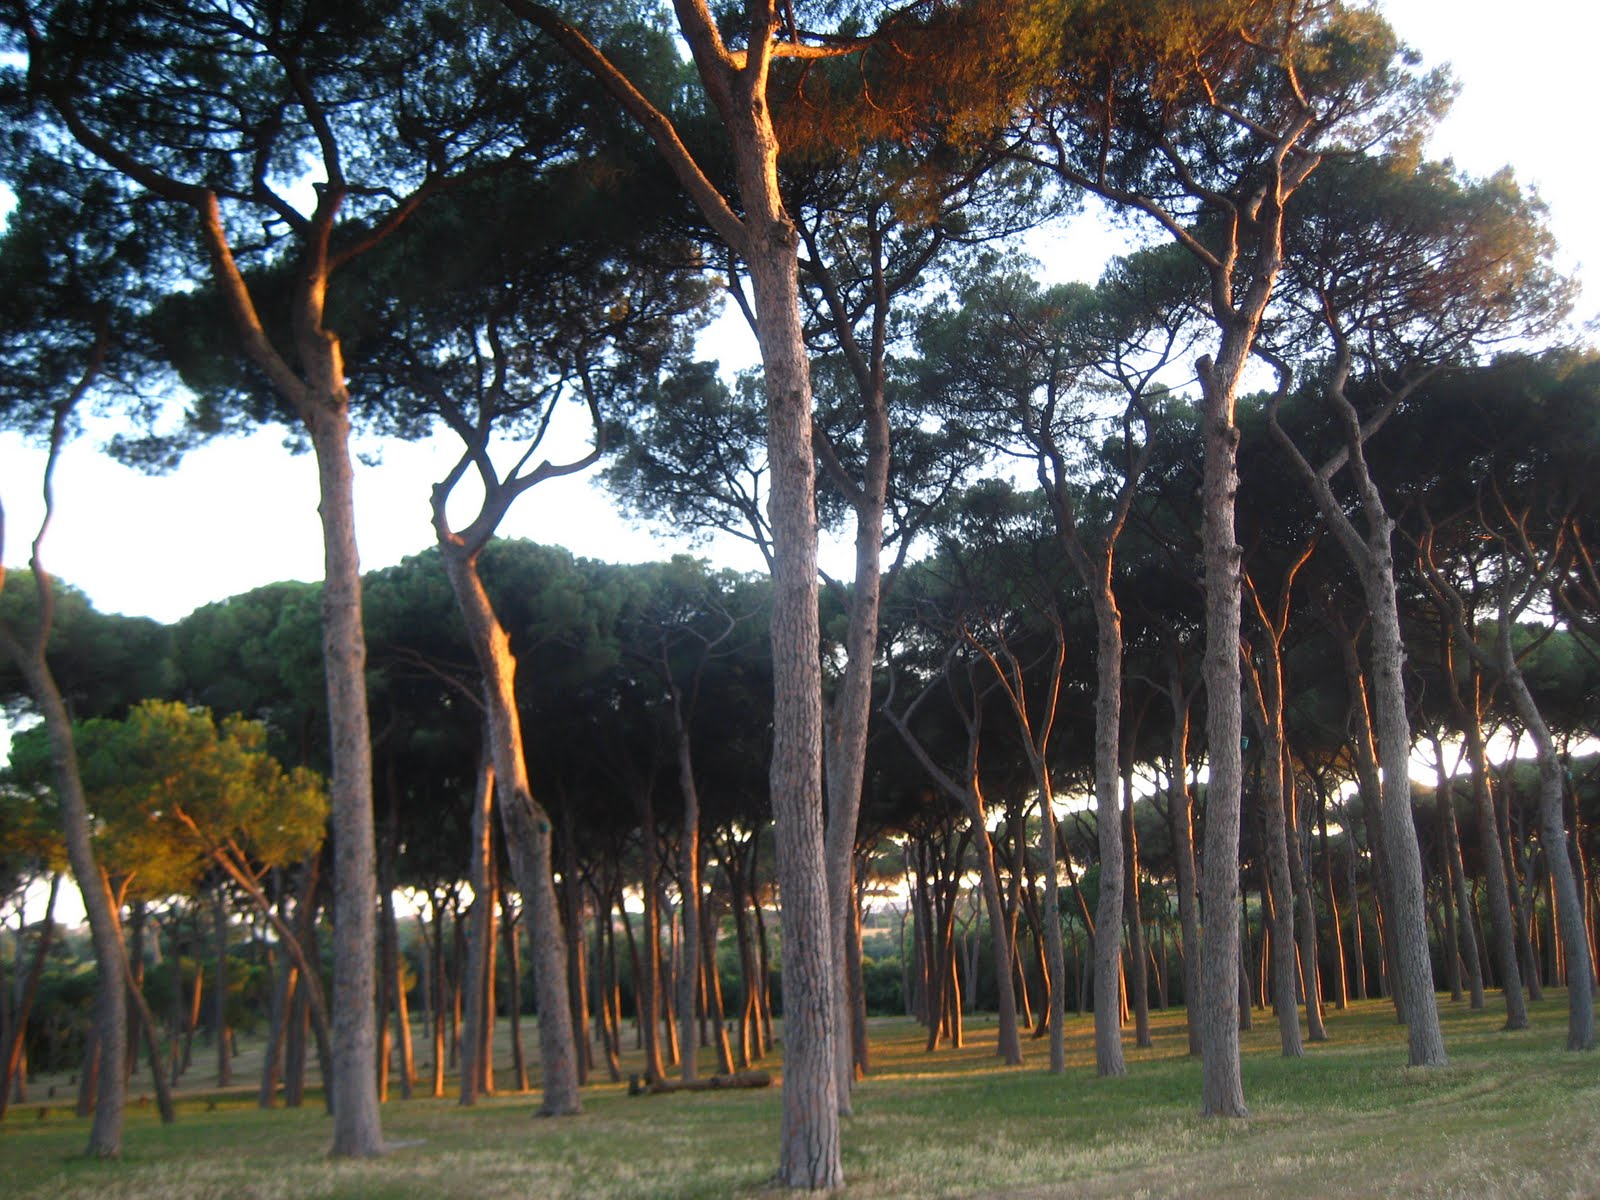 Umbrella Pines in Villa Pamphilj, Rome. © Tiffany Parks